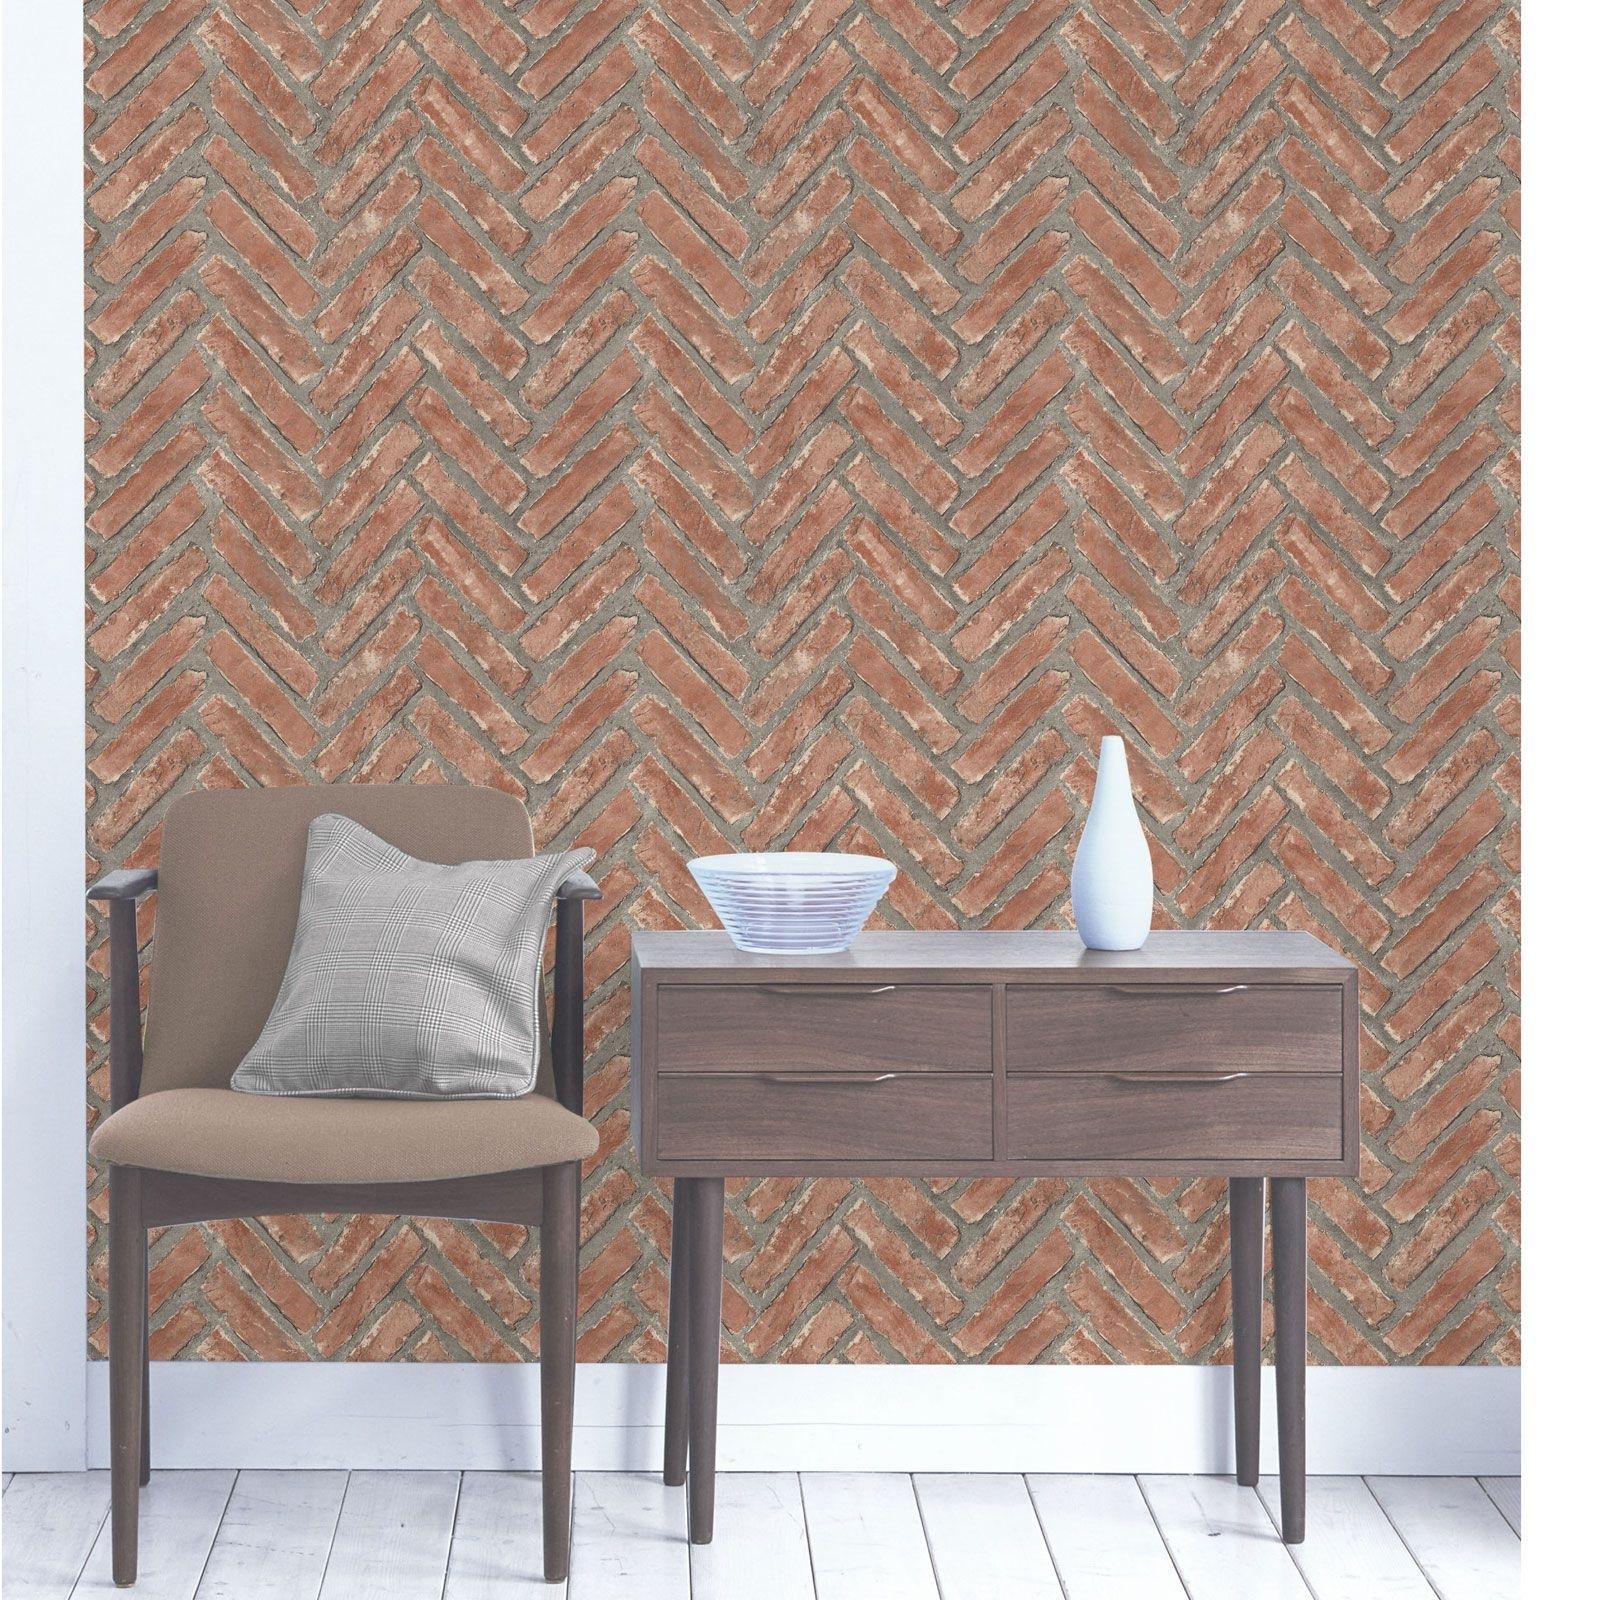 Popular Kijiji Mississauga Sectional Sofas Regarding Bedroom Set Kijiji Kitchener Brick Furniture Mississauga Frames (View 18 of 20)